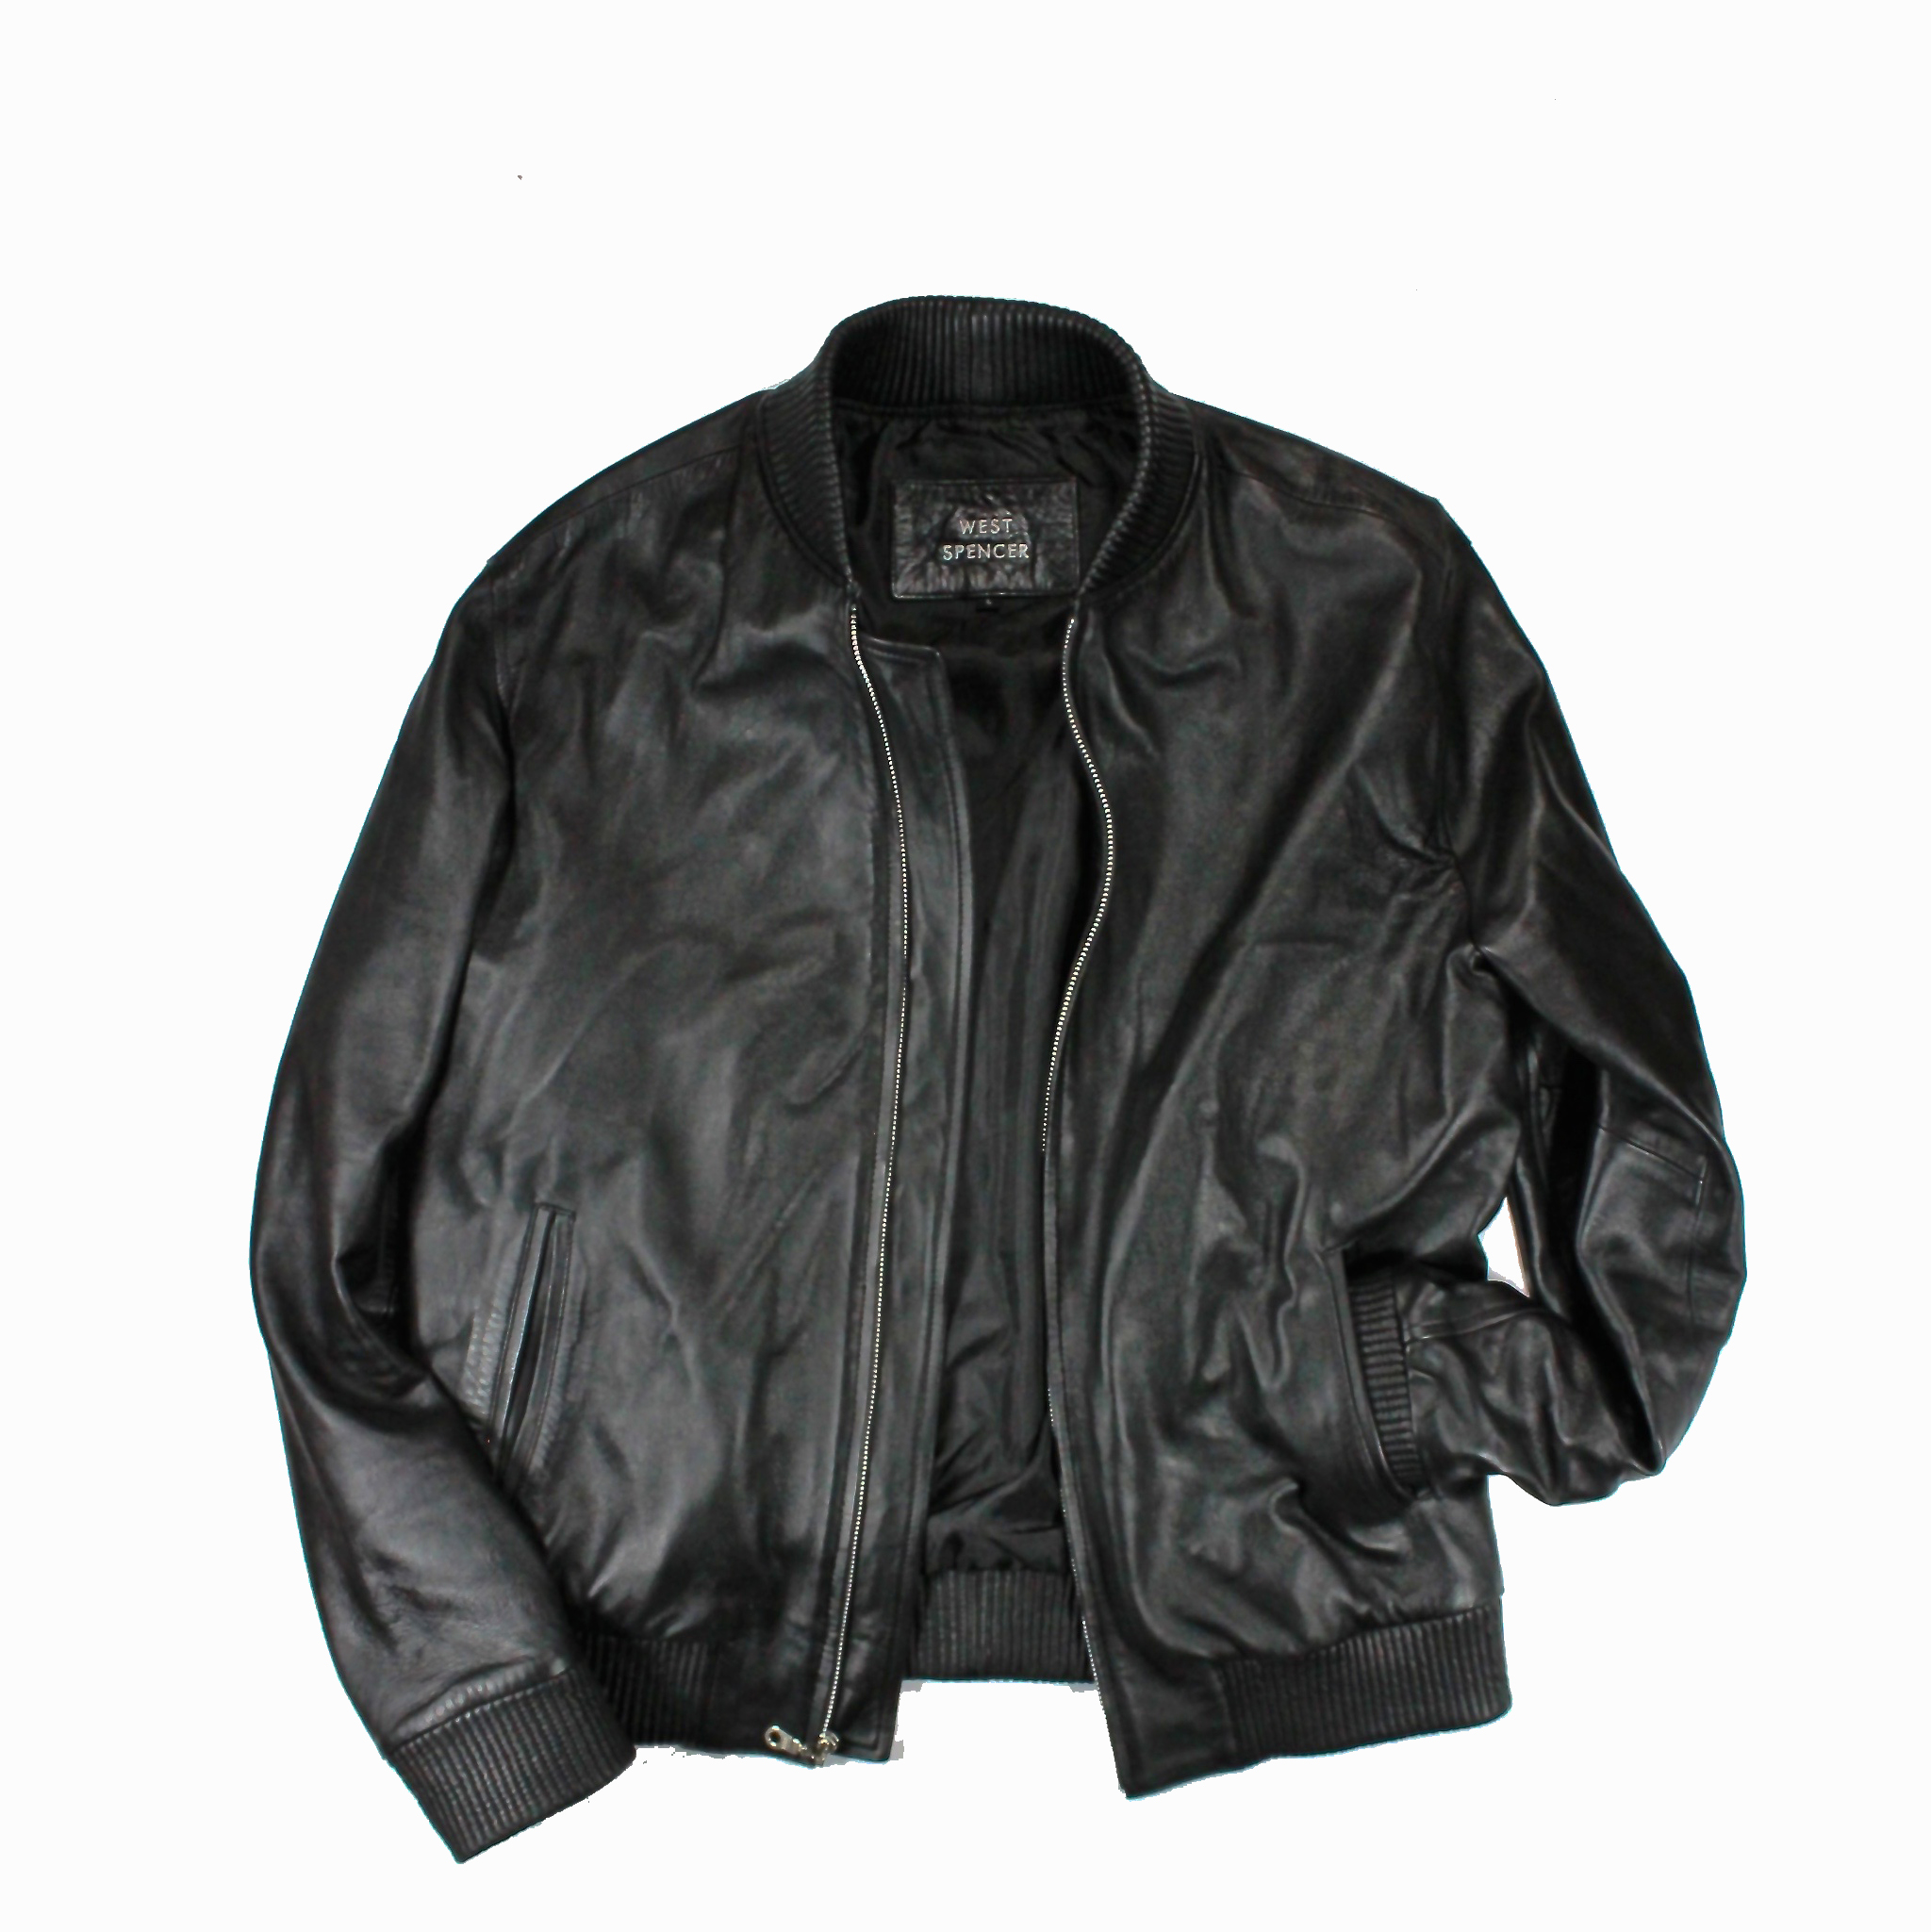 final bomber jacket.jpg